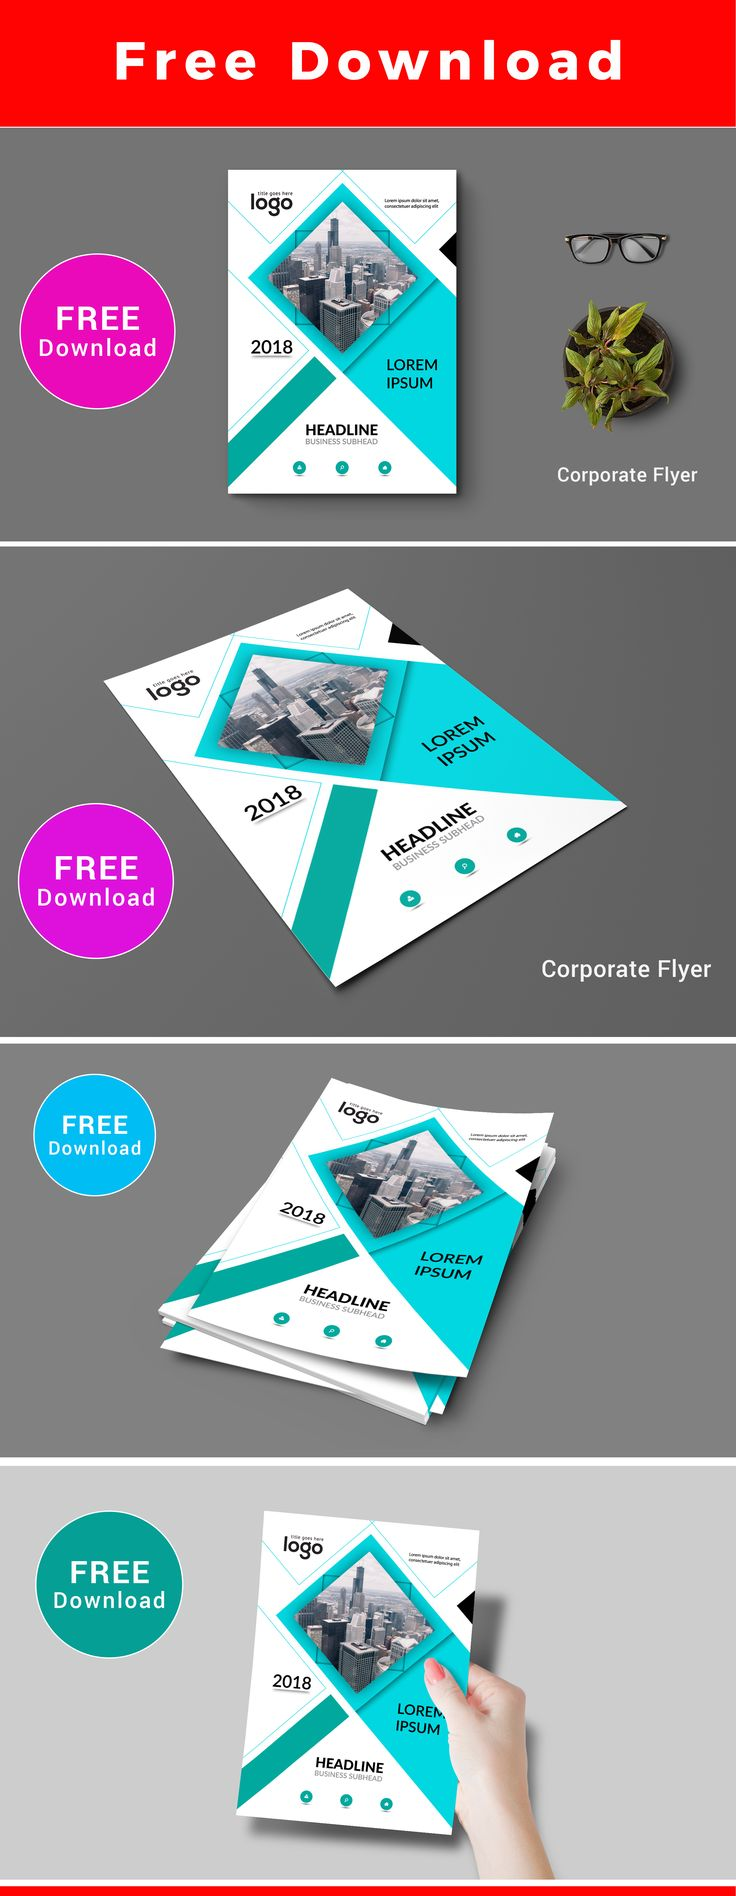 Free Download Flyer #free #download #creative #mnimal #fashione #corporate #